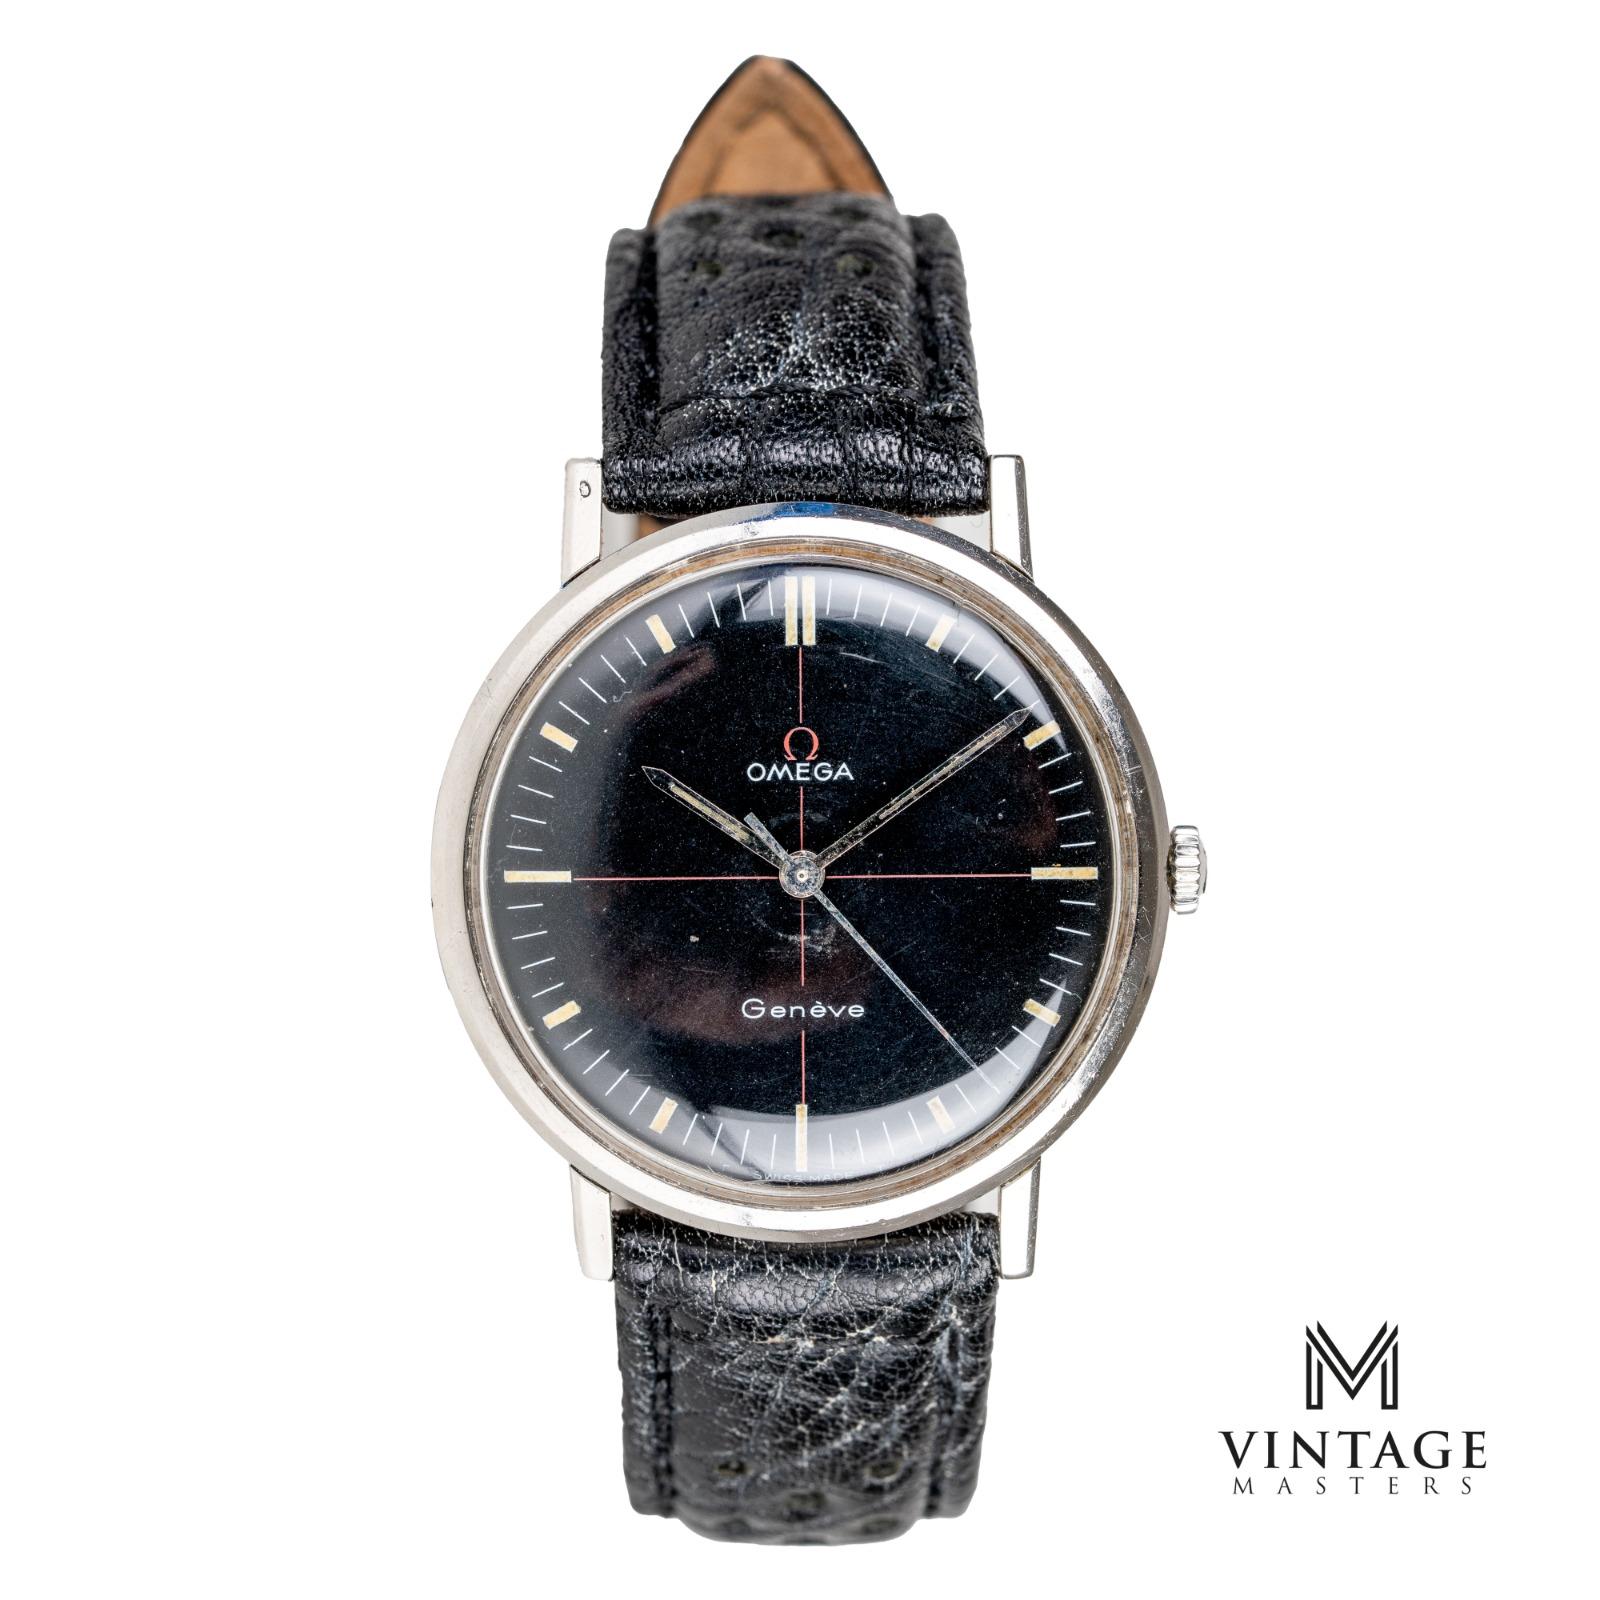 vintage Omega geneve technical dial 131019 vintage watch front